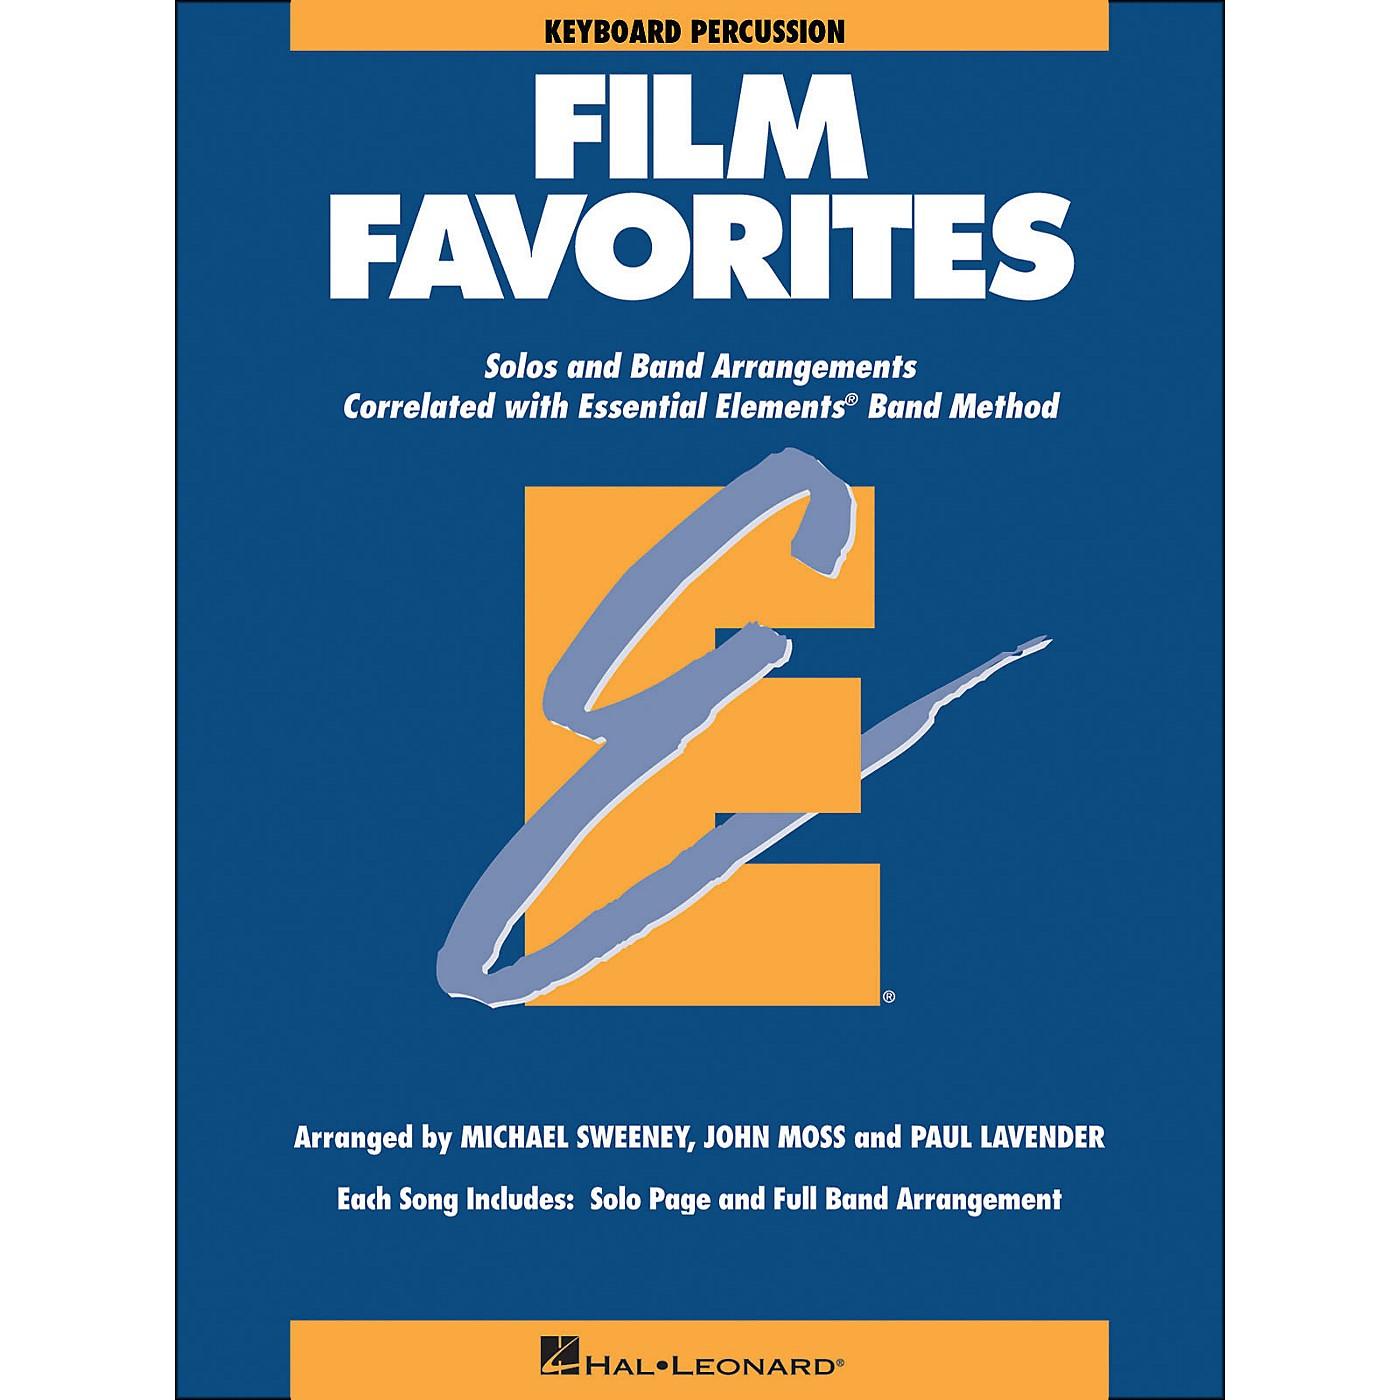 Hal Leonard Film Favorites Keyboard Percussion thumbnail